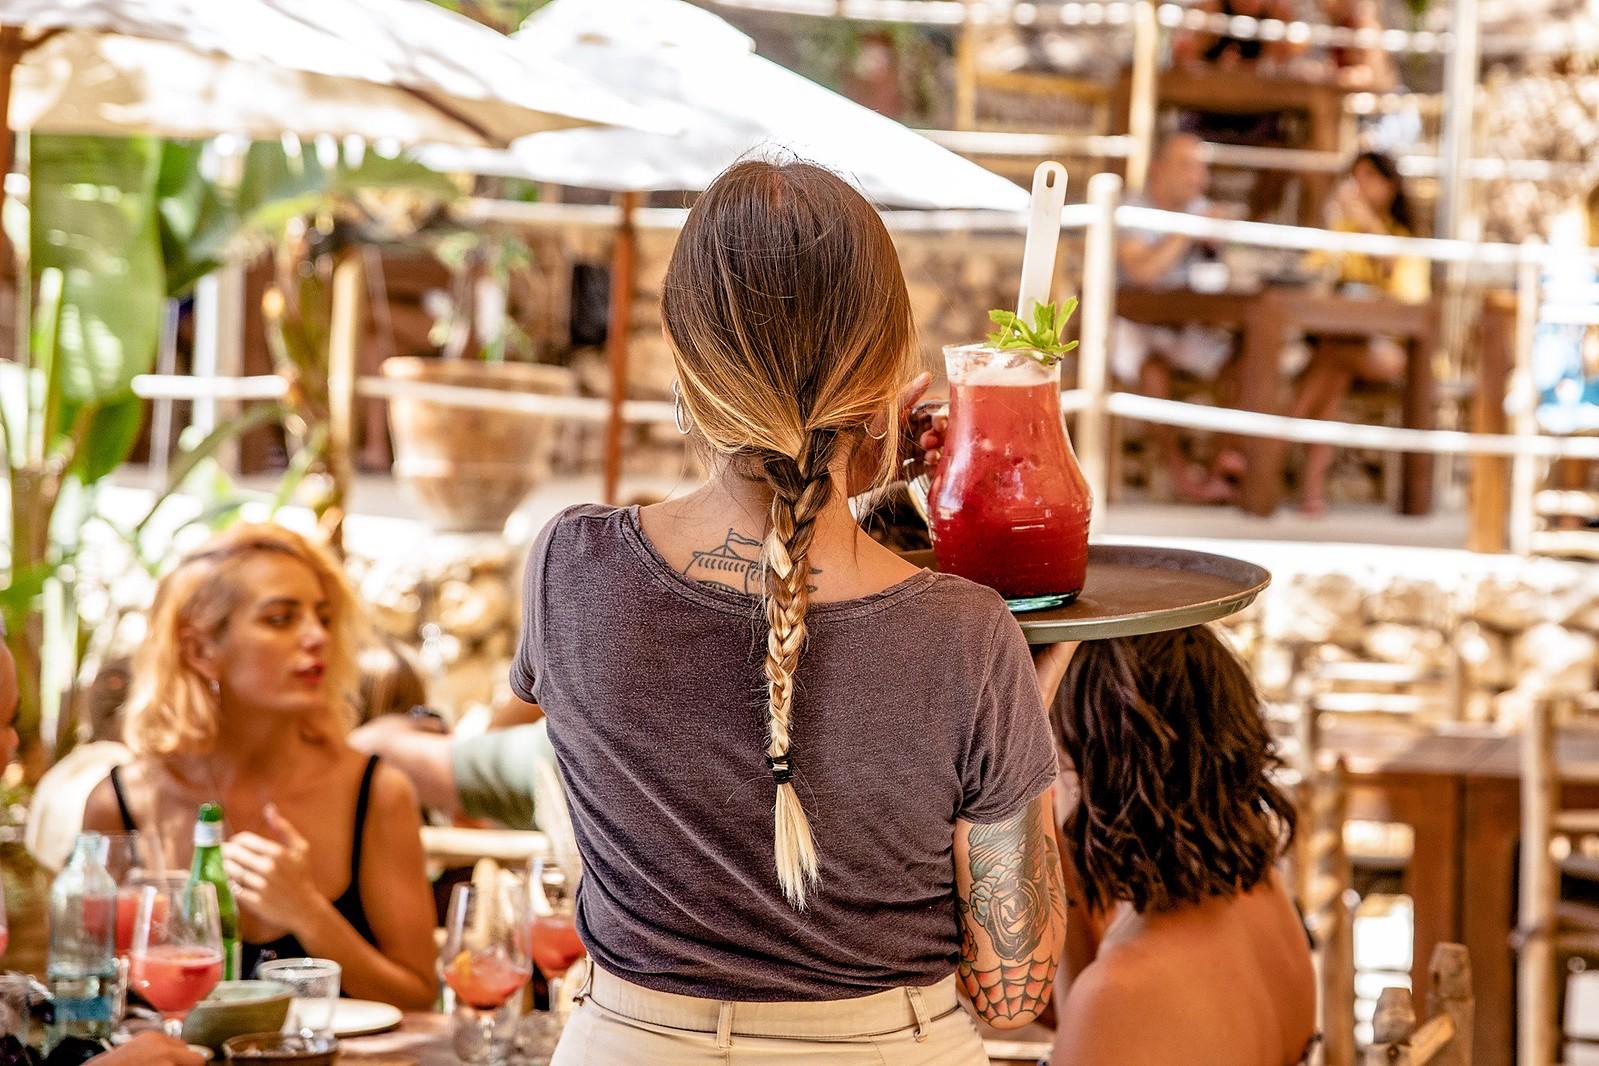 https://www.white-ibiza.com/wp-content/uploads/2020/09/white-ibiza-beach-restaurants-cala-gracioneta-chiringuito-13.jpg